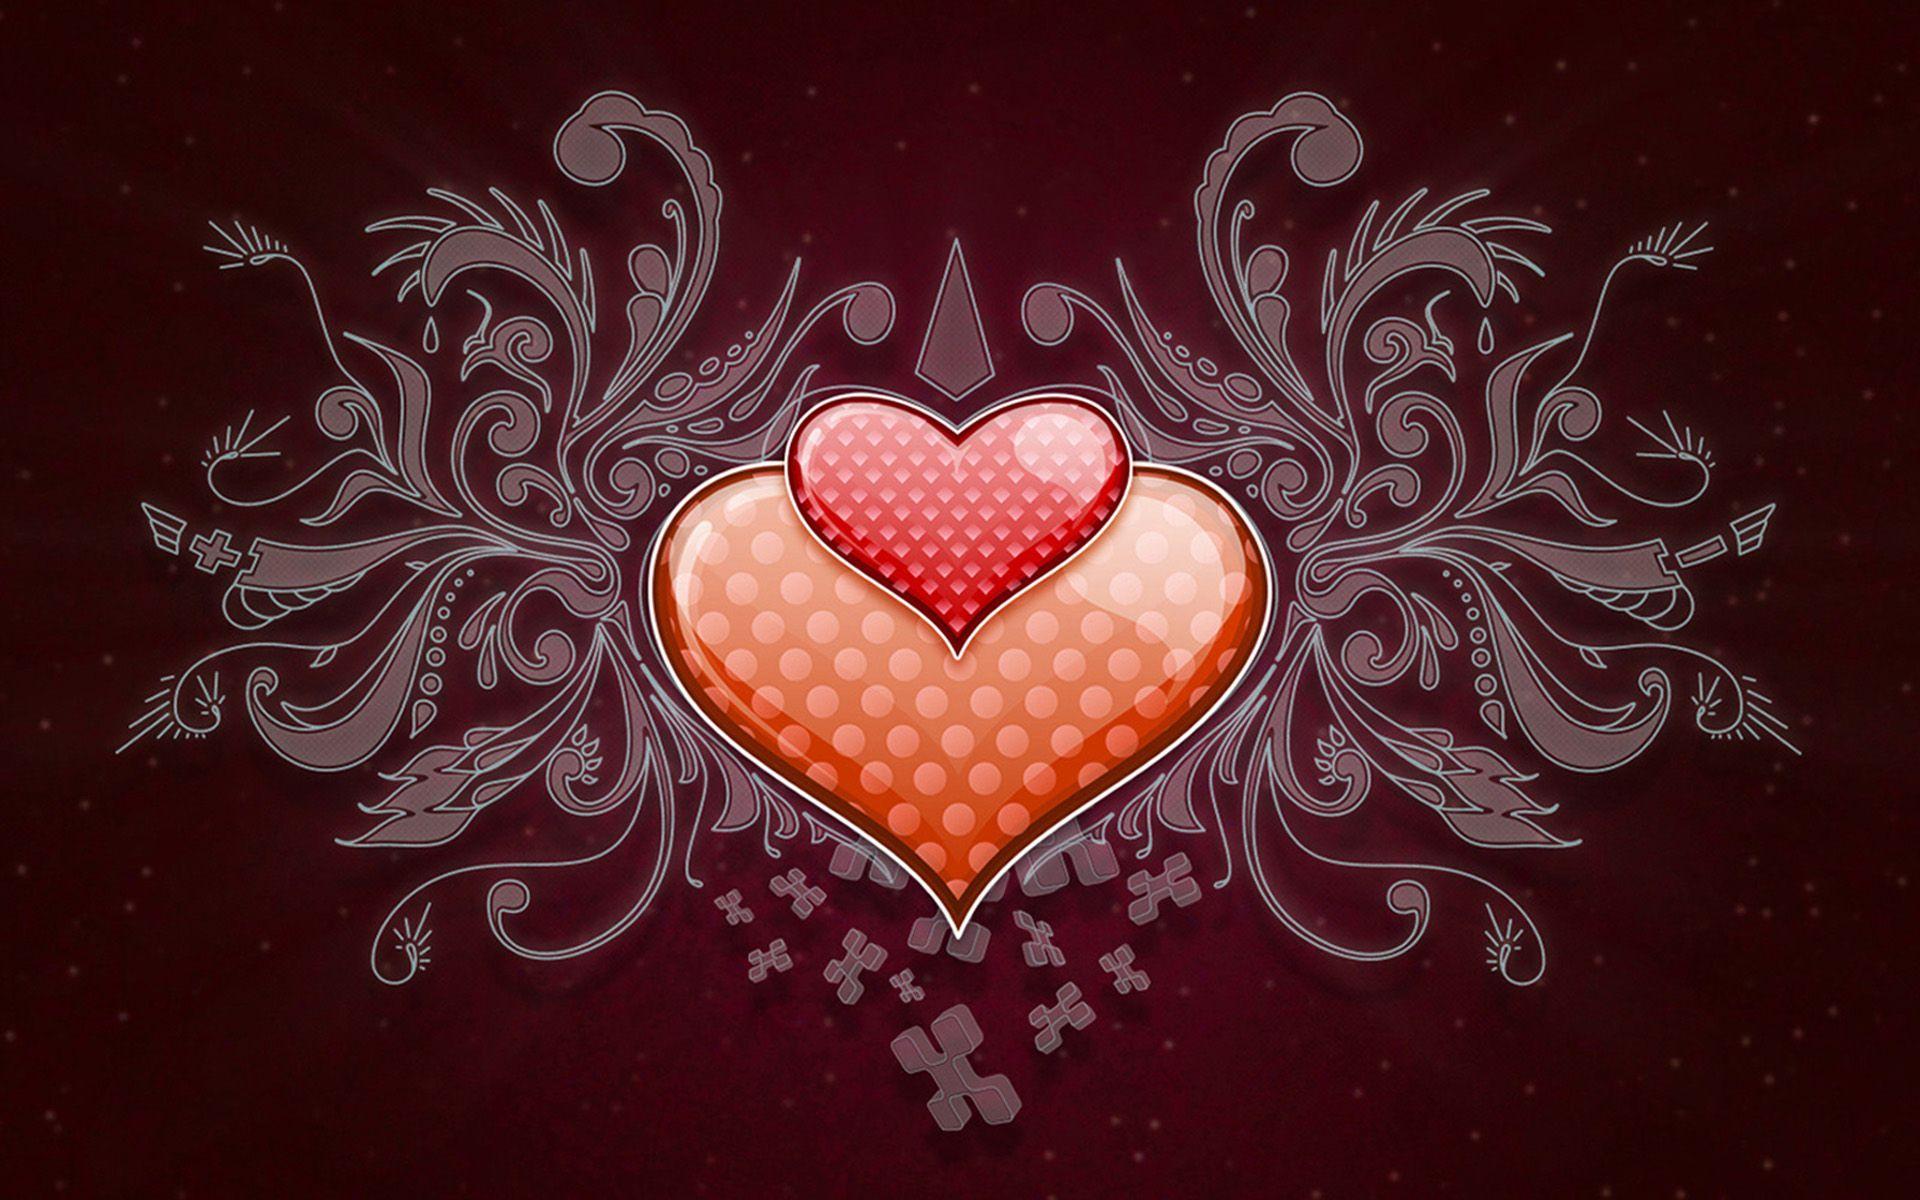 Popular Wallpaper Horse Valentines Day - edc5da40e98645d85b89ca4a5dcad320  Pictures_734377.jpg